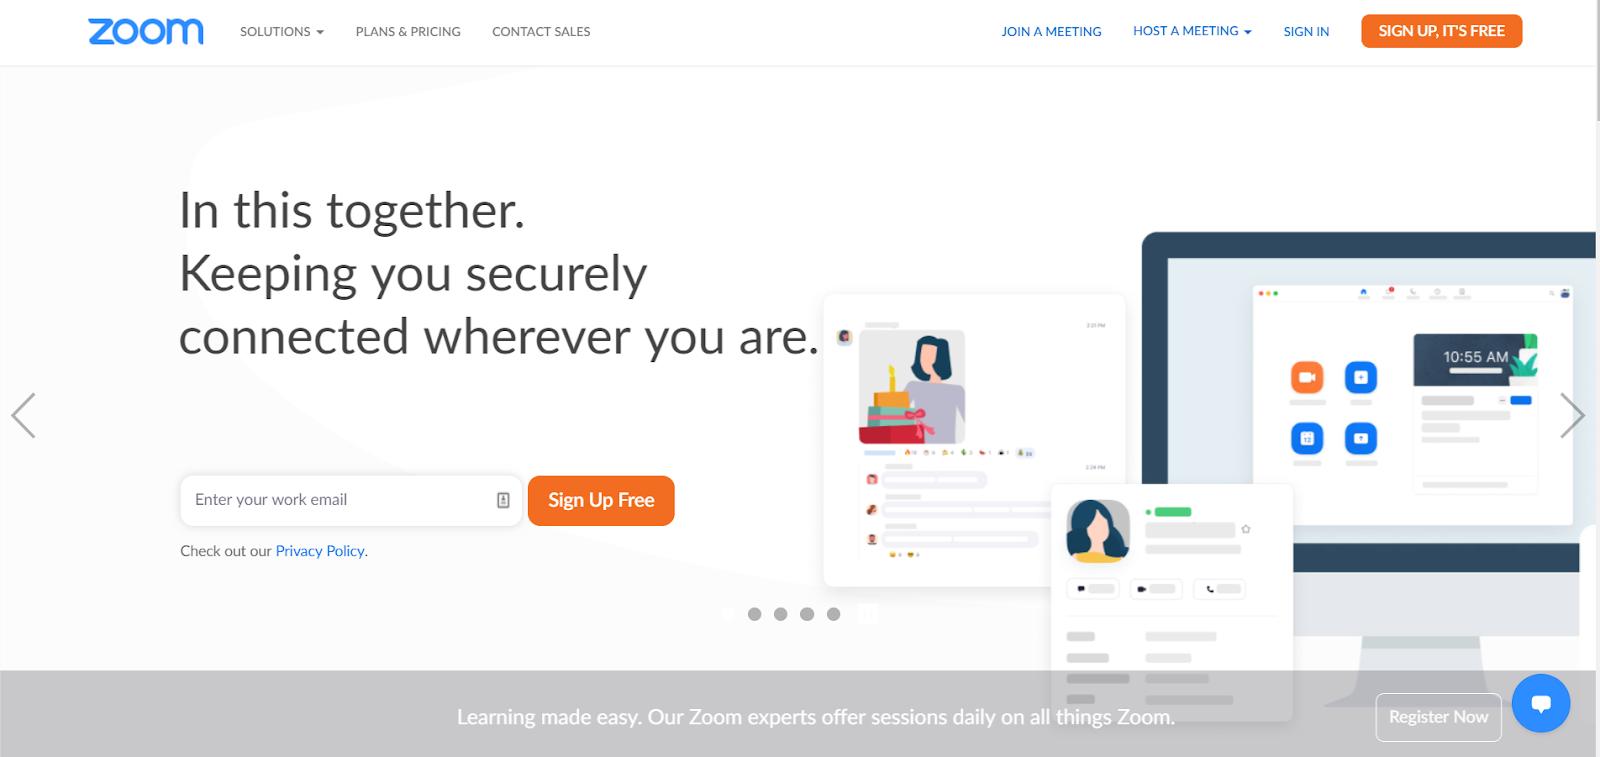 Zoom product marketing